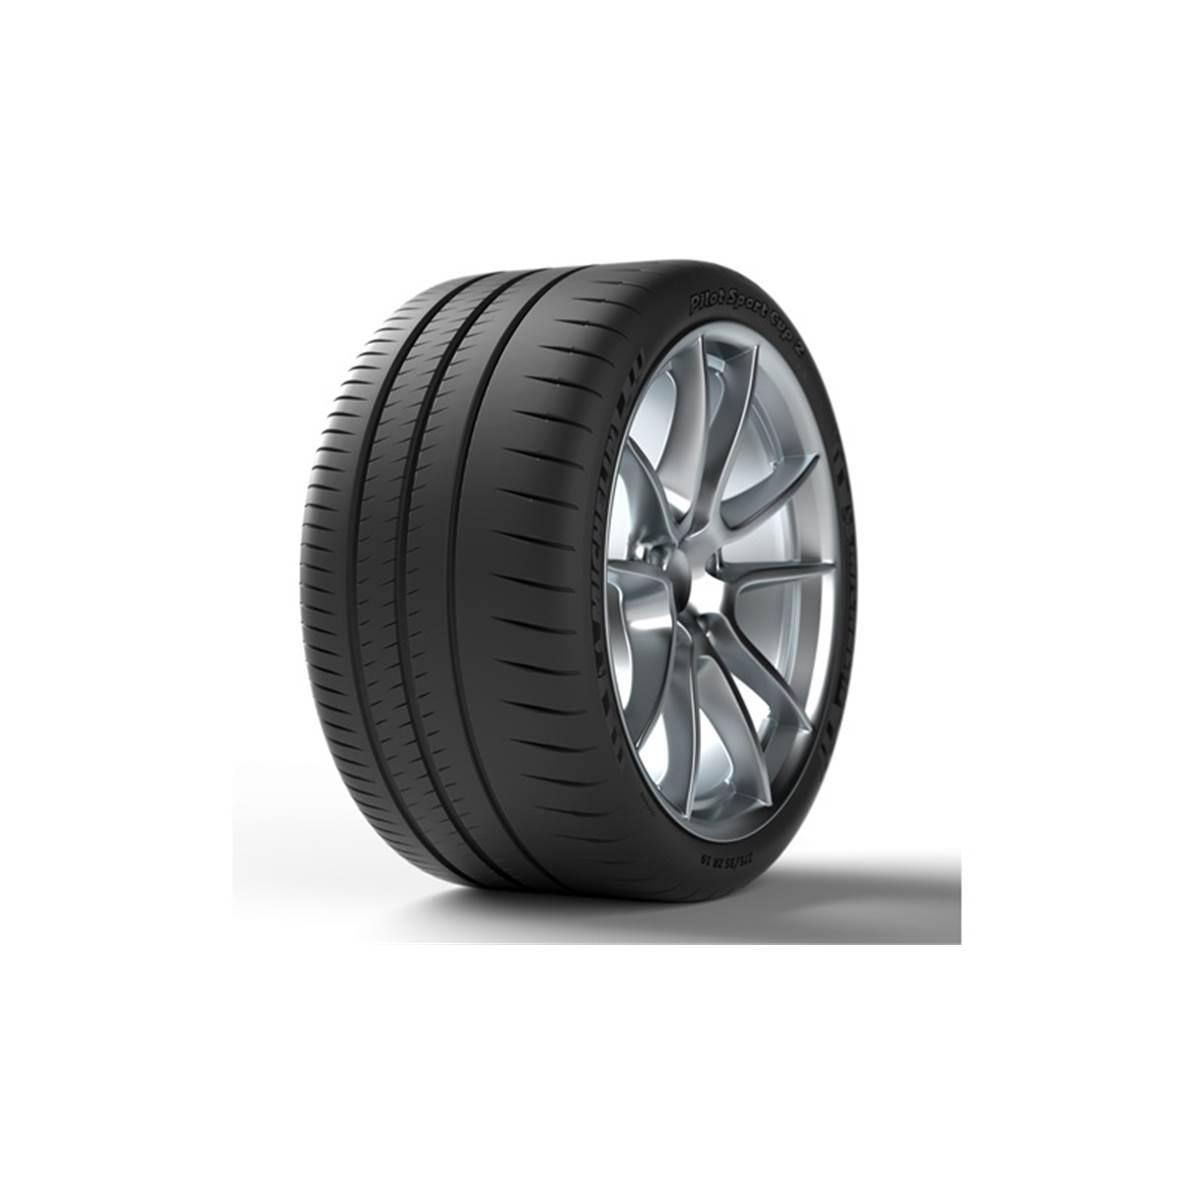 Pneu Michelin 345/30R20 106Y Pilot Sport Cup 2